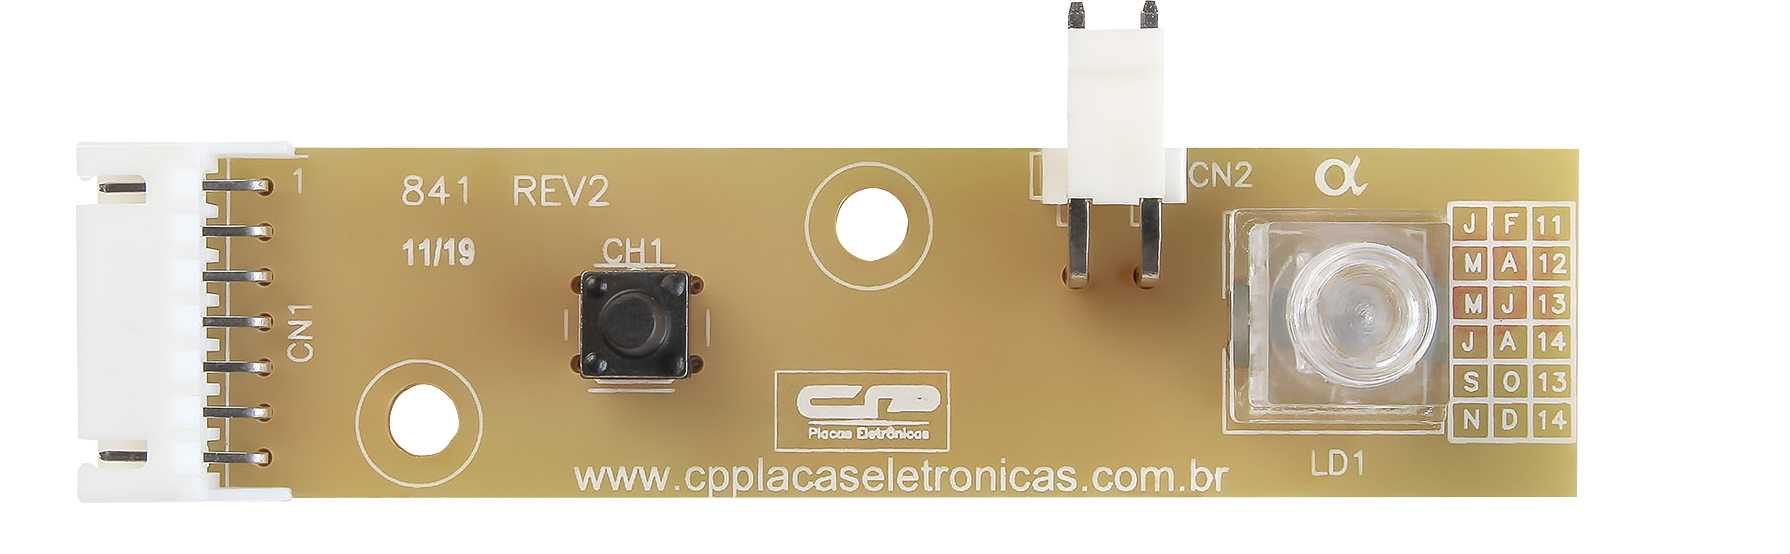 Placa Interface compatível Lavadora Electrolux lt60 bivolt